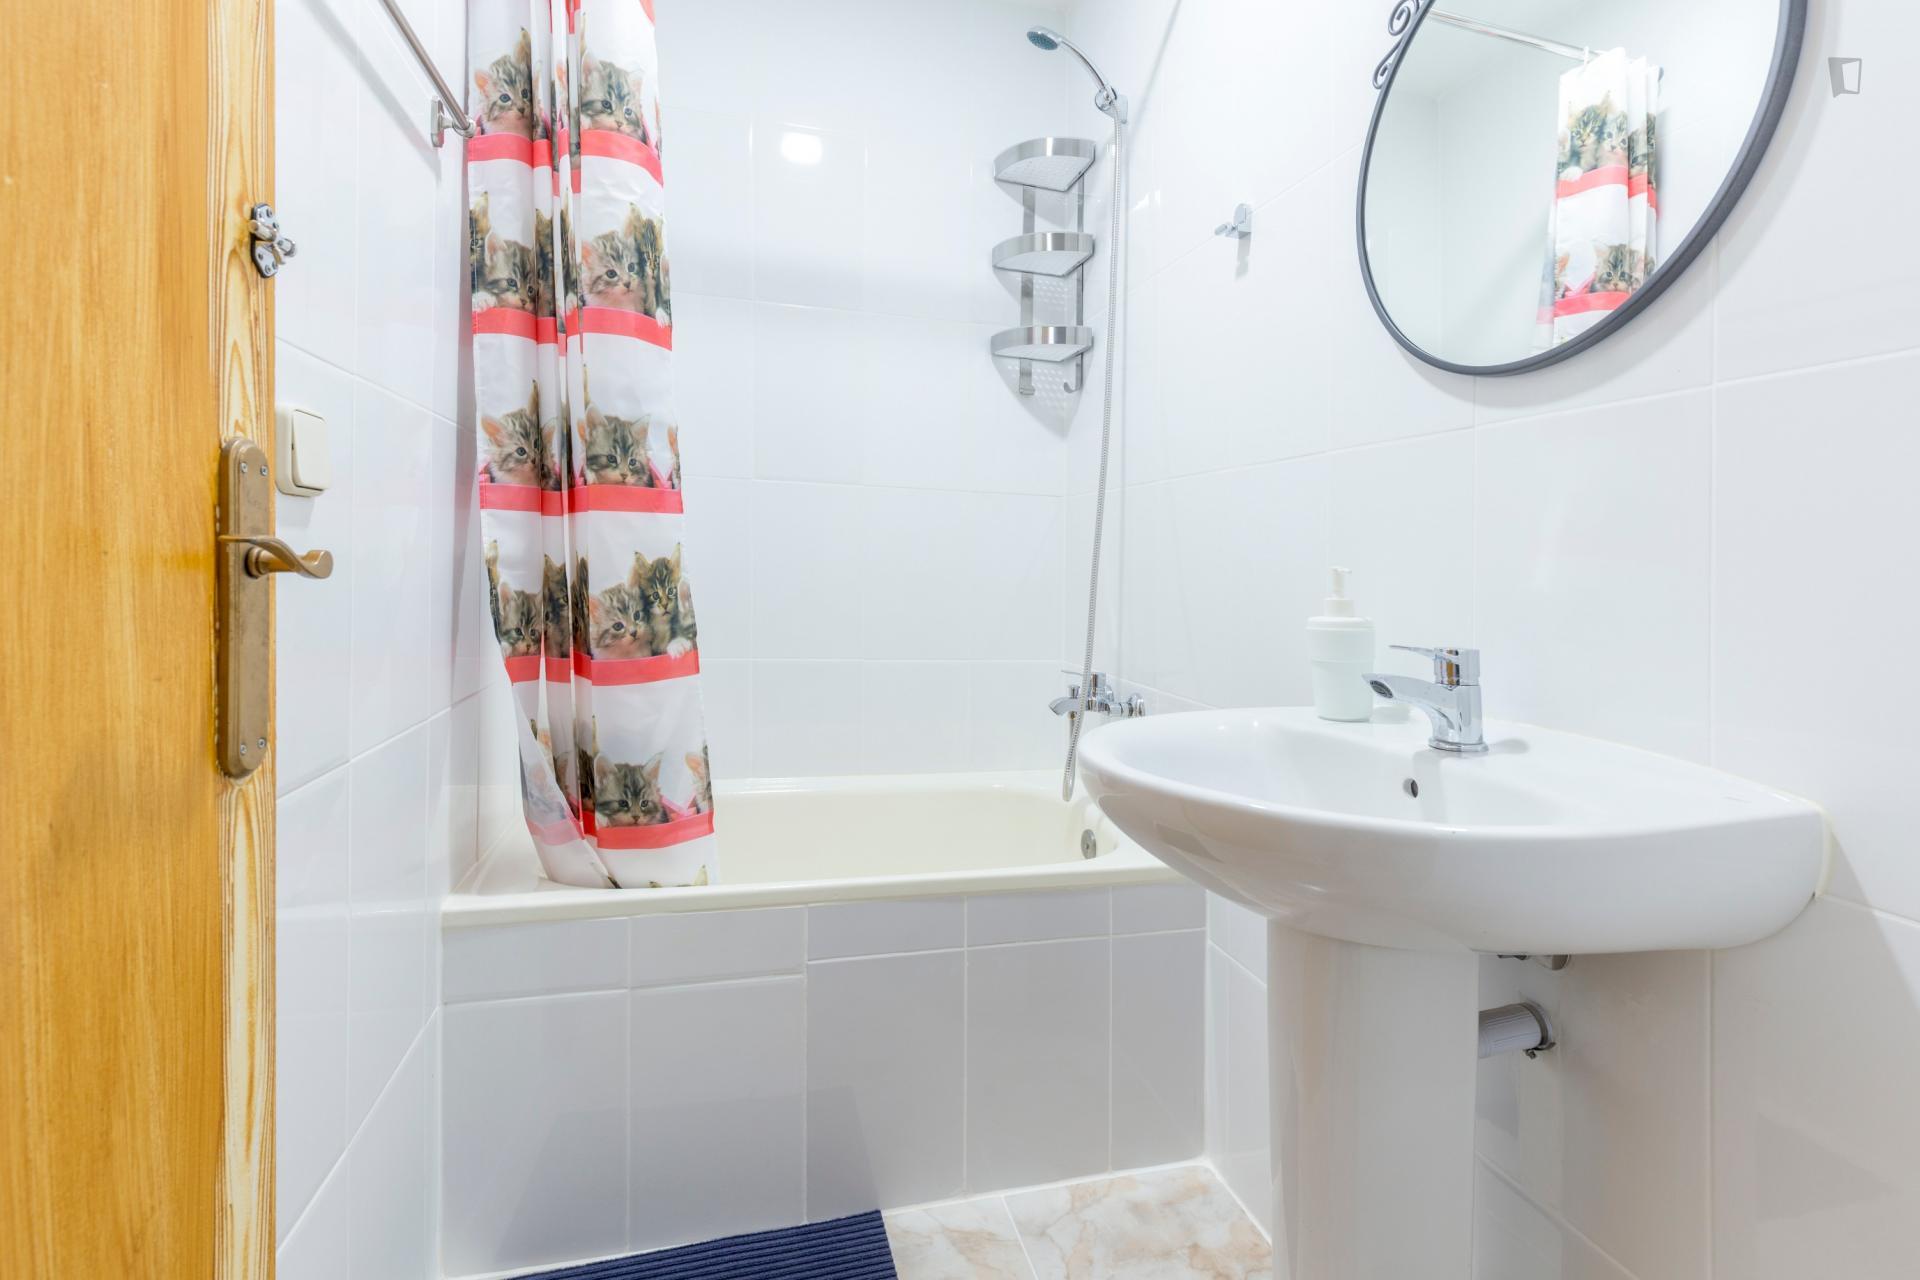 Raval - 4 bedroom shared flat in Barcelona